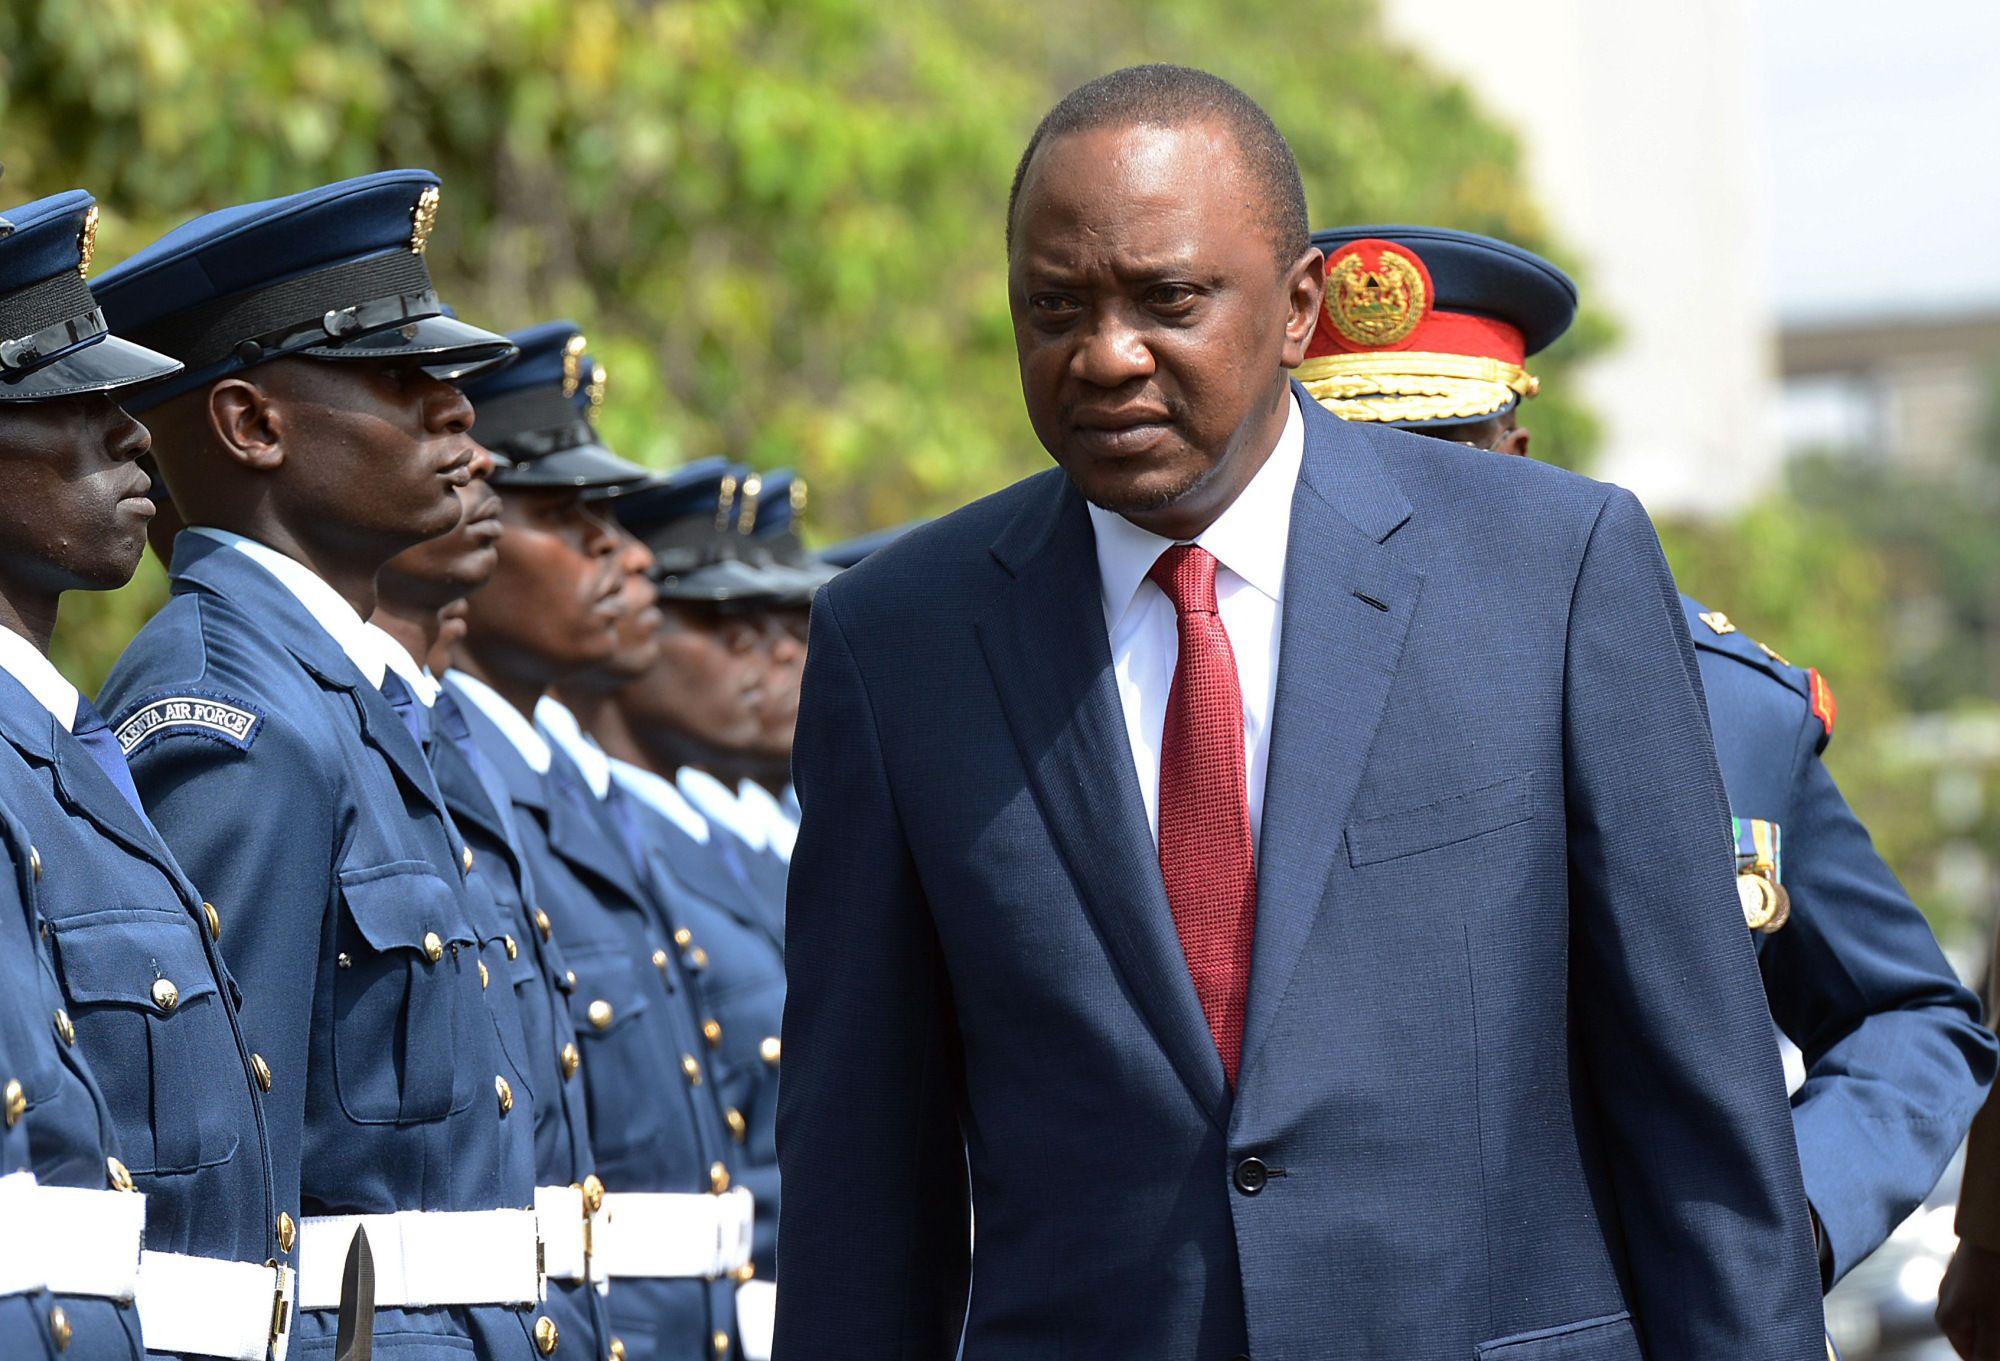 SupremeCapitalGroup on Kenya, Exposed, East africa